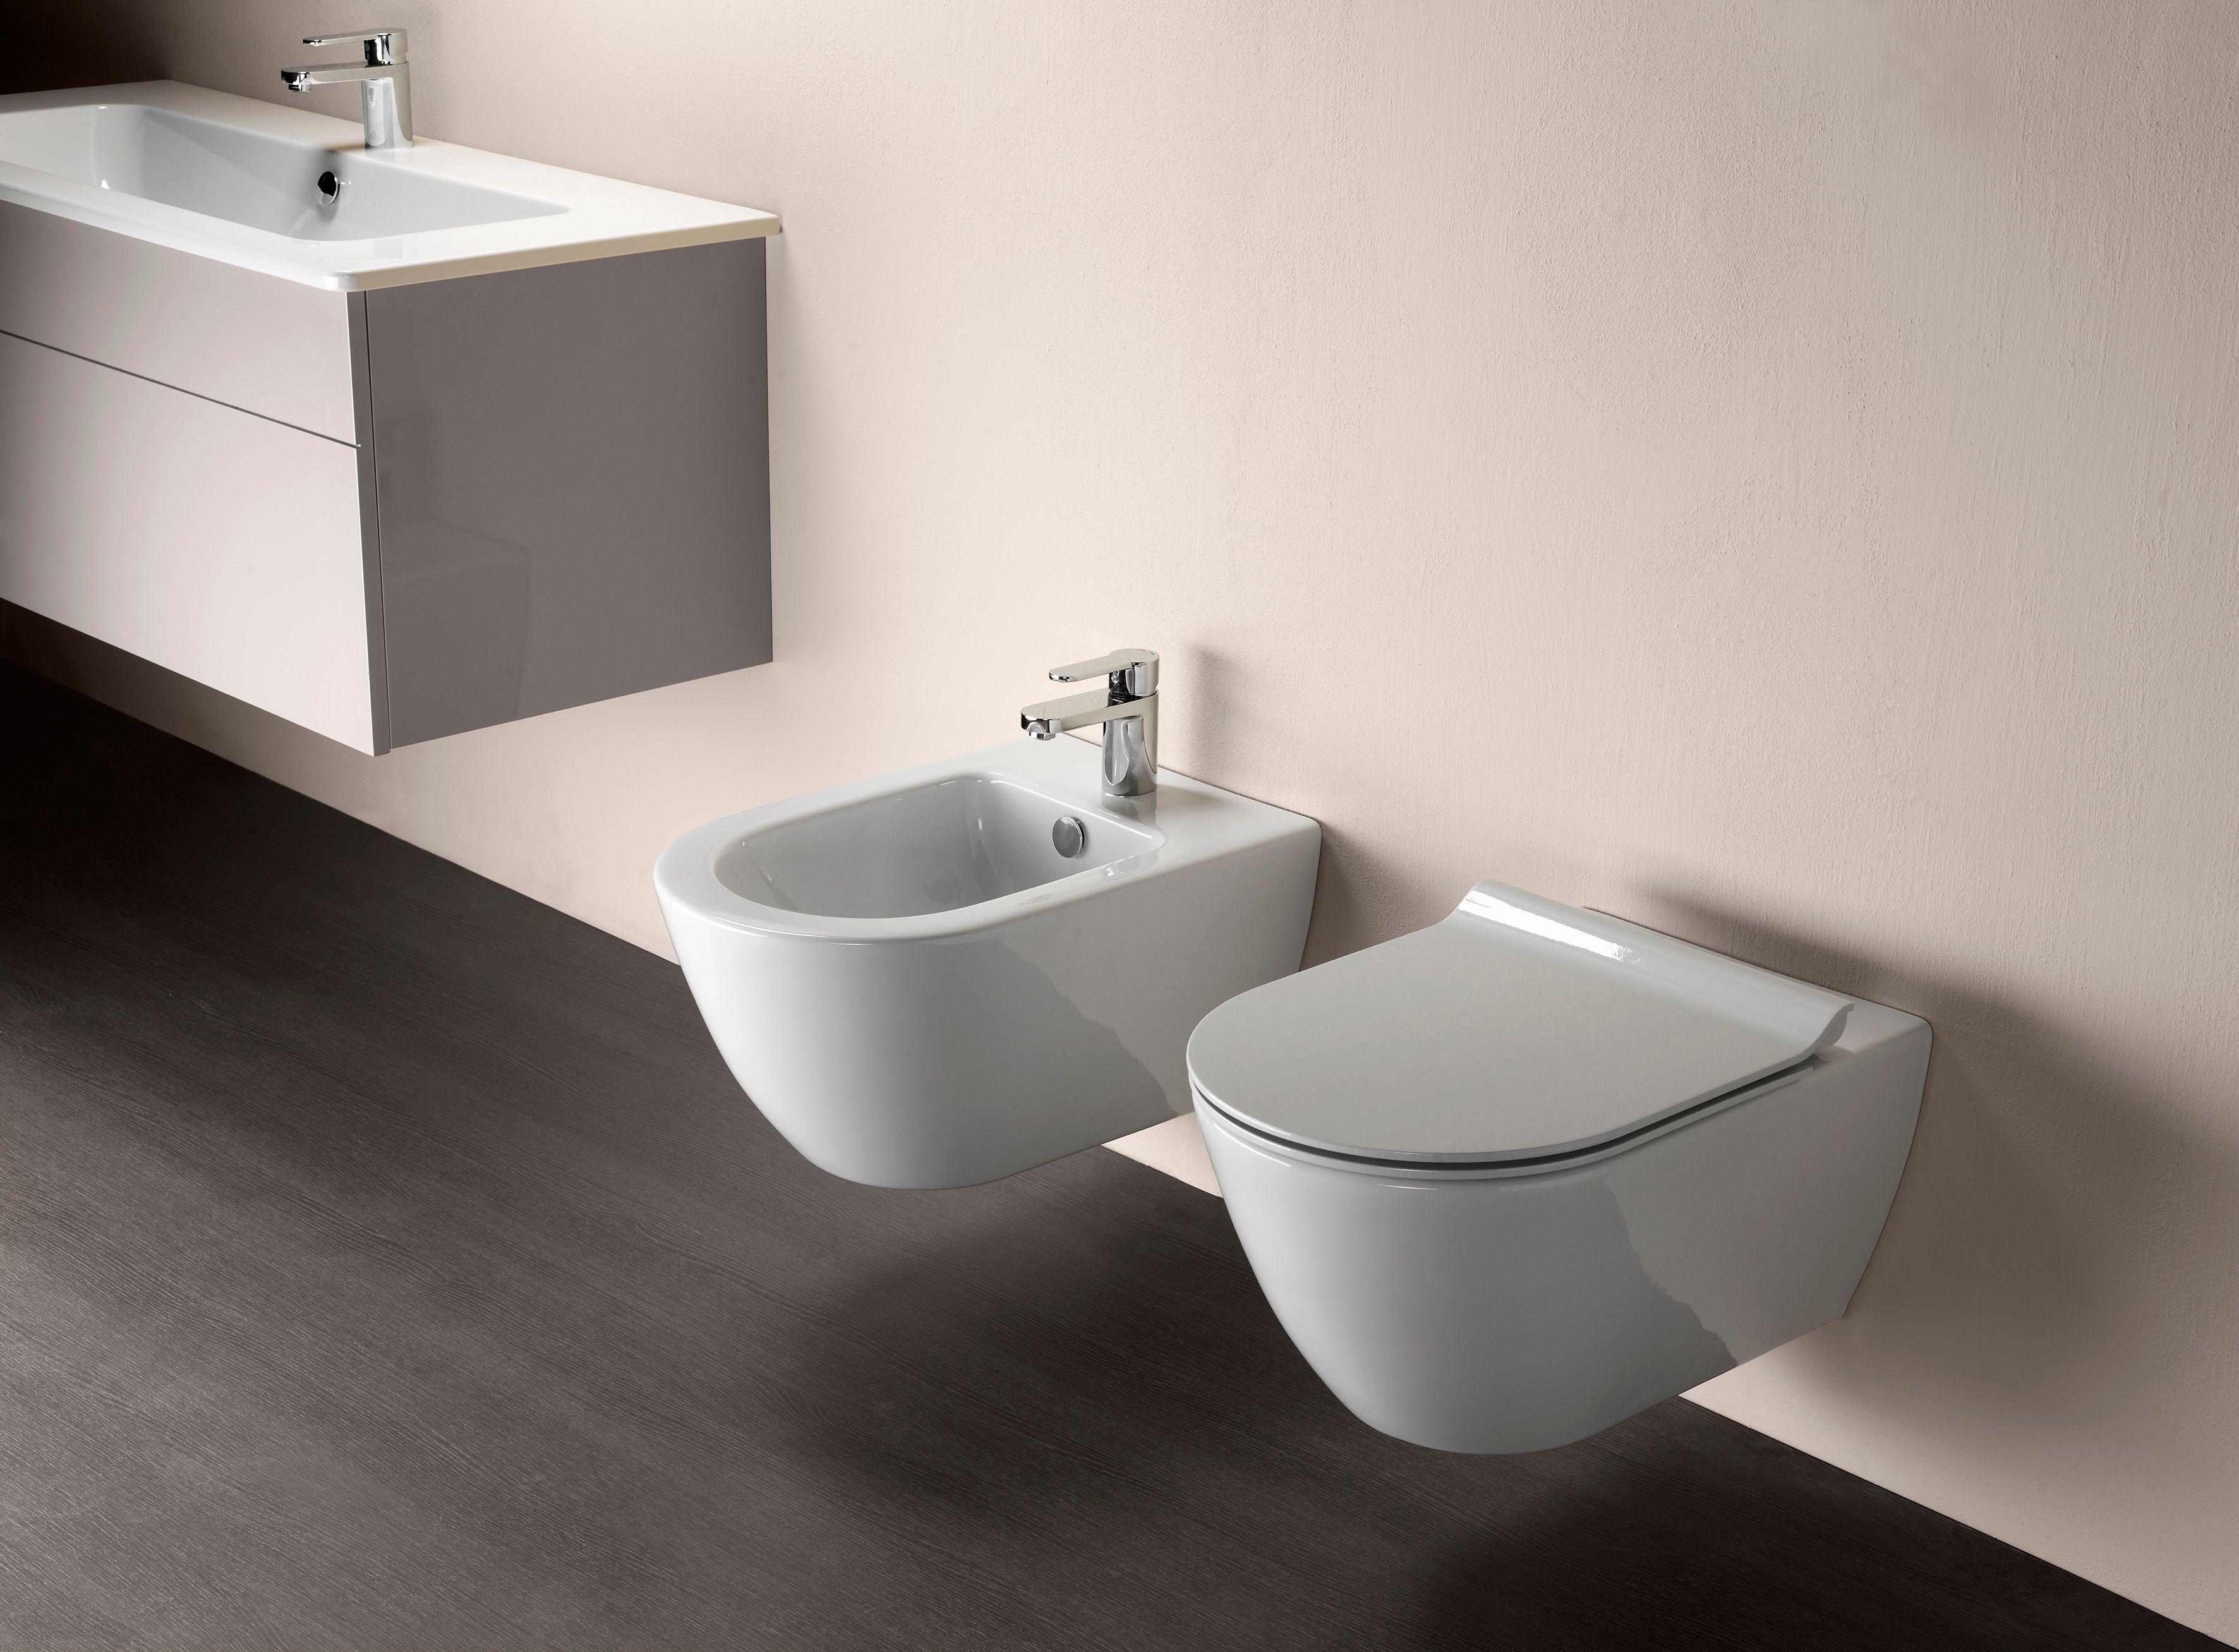 Pura 55 Wall Hung Toilet Pura Series By Gsi Ceramica